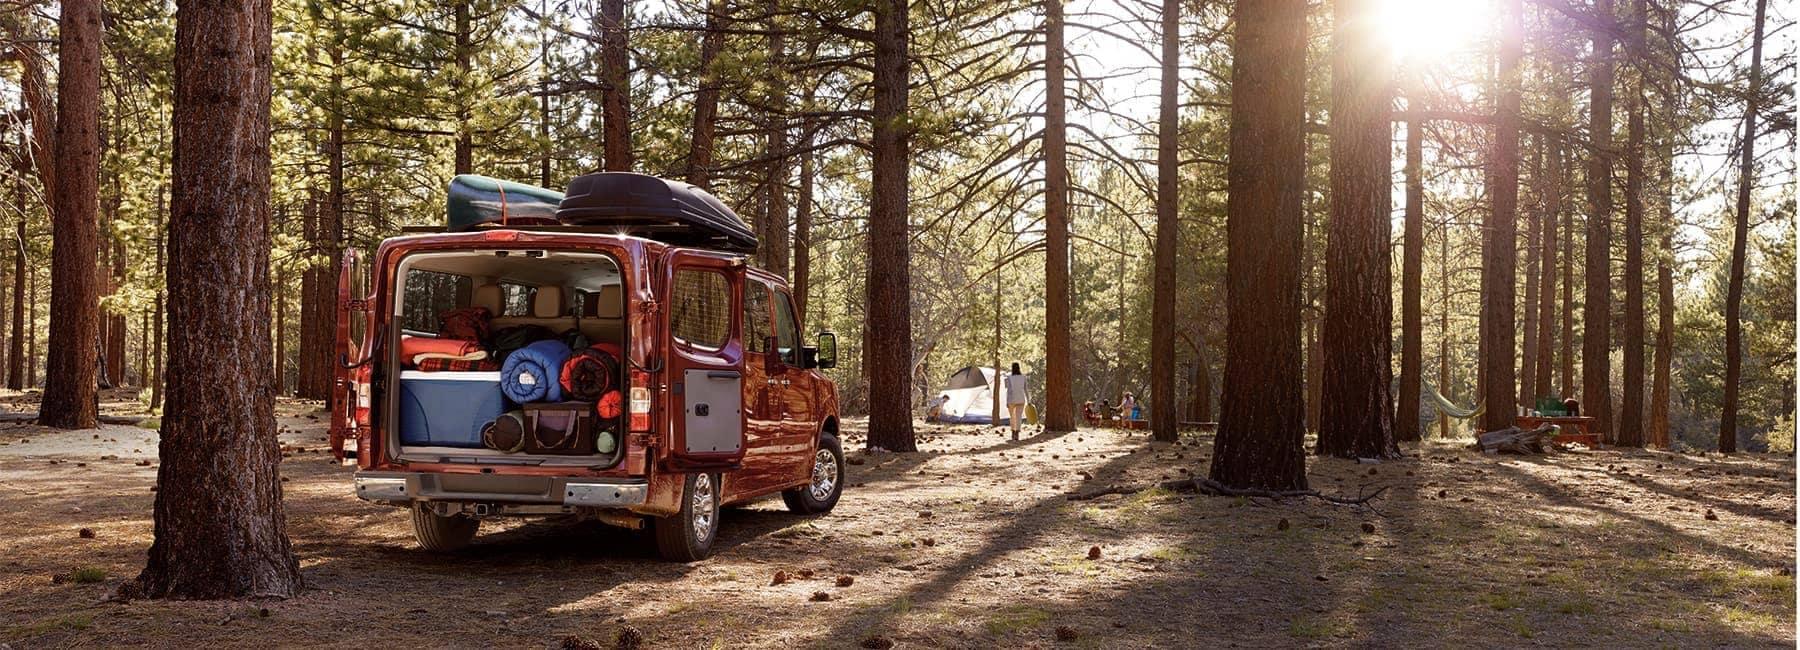 2020-nissan-nv-passenger--exterior-parked-forest